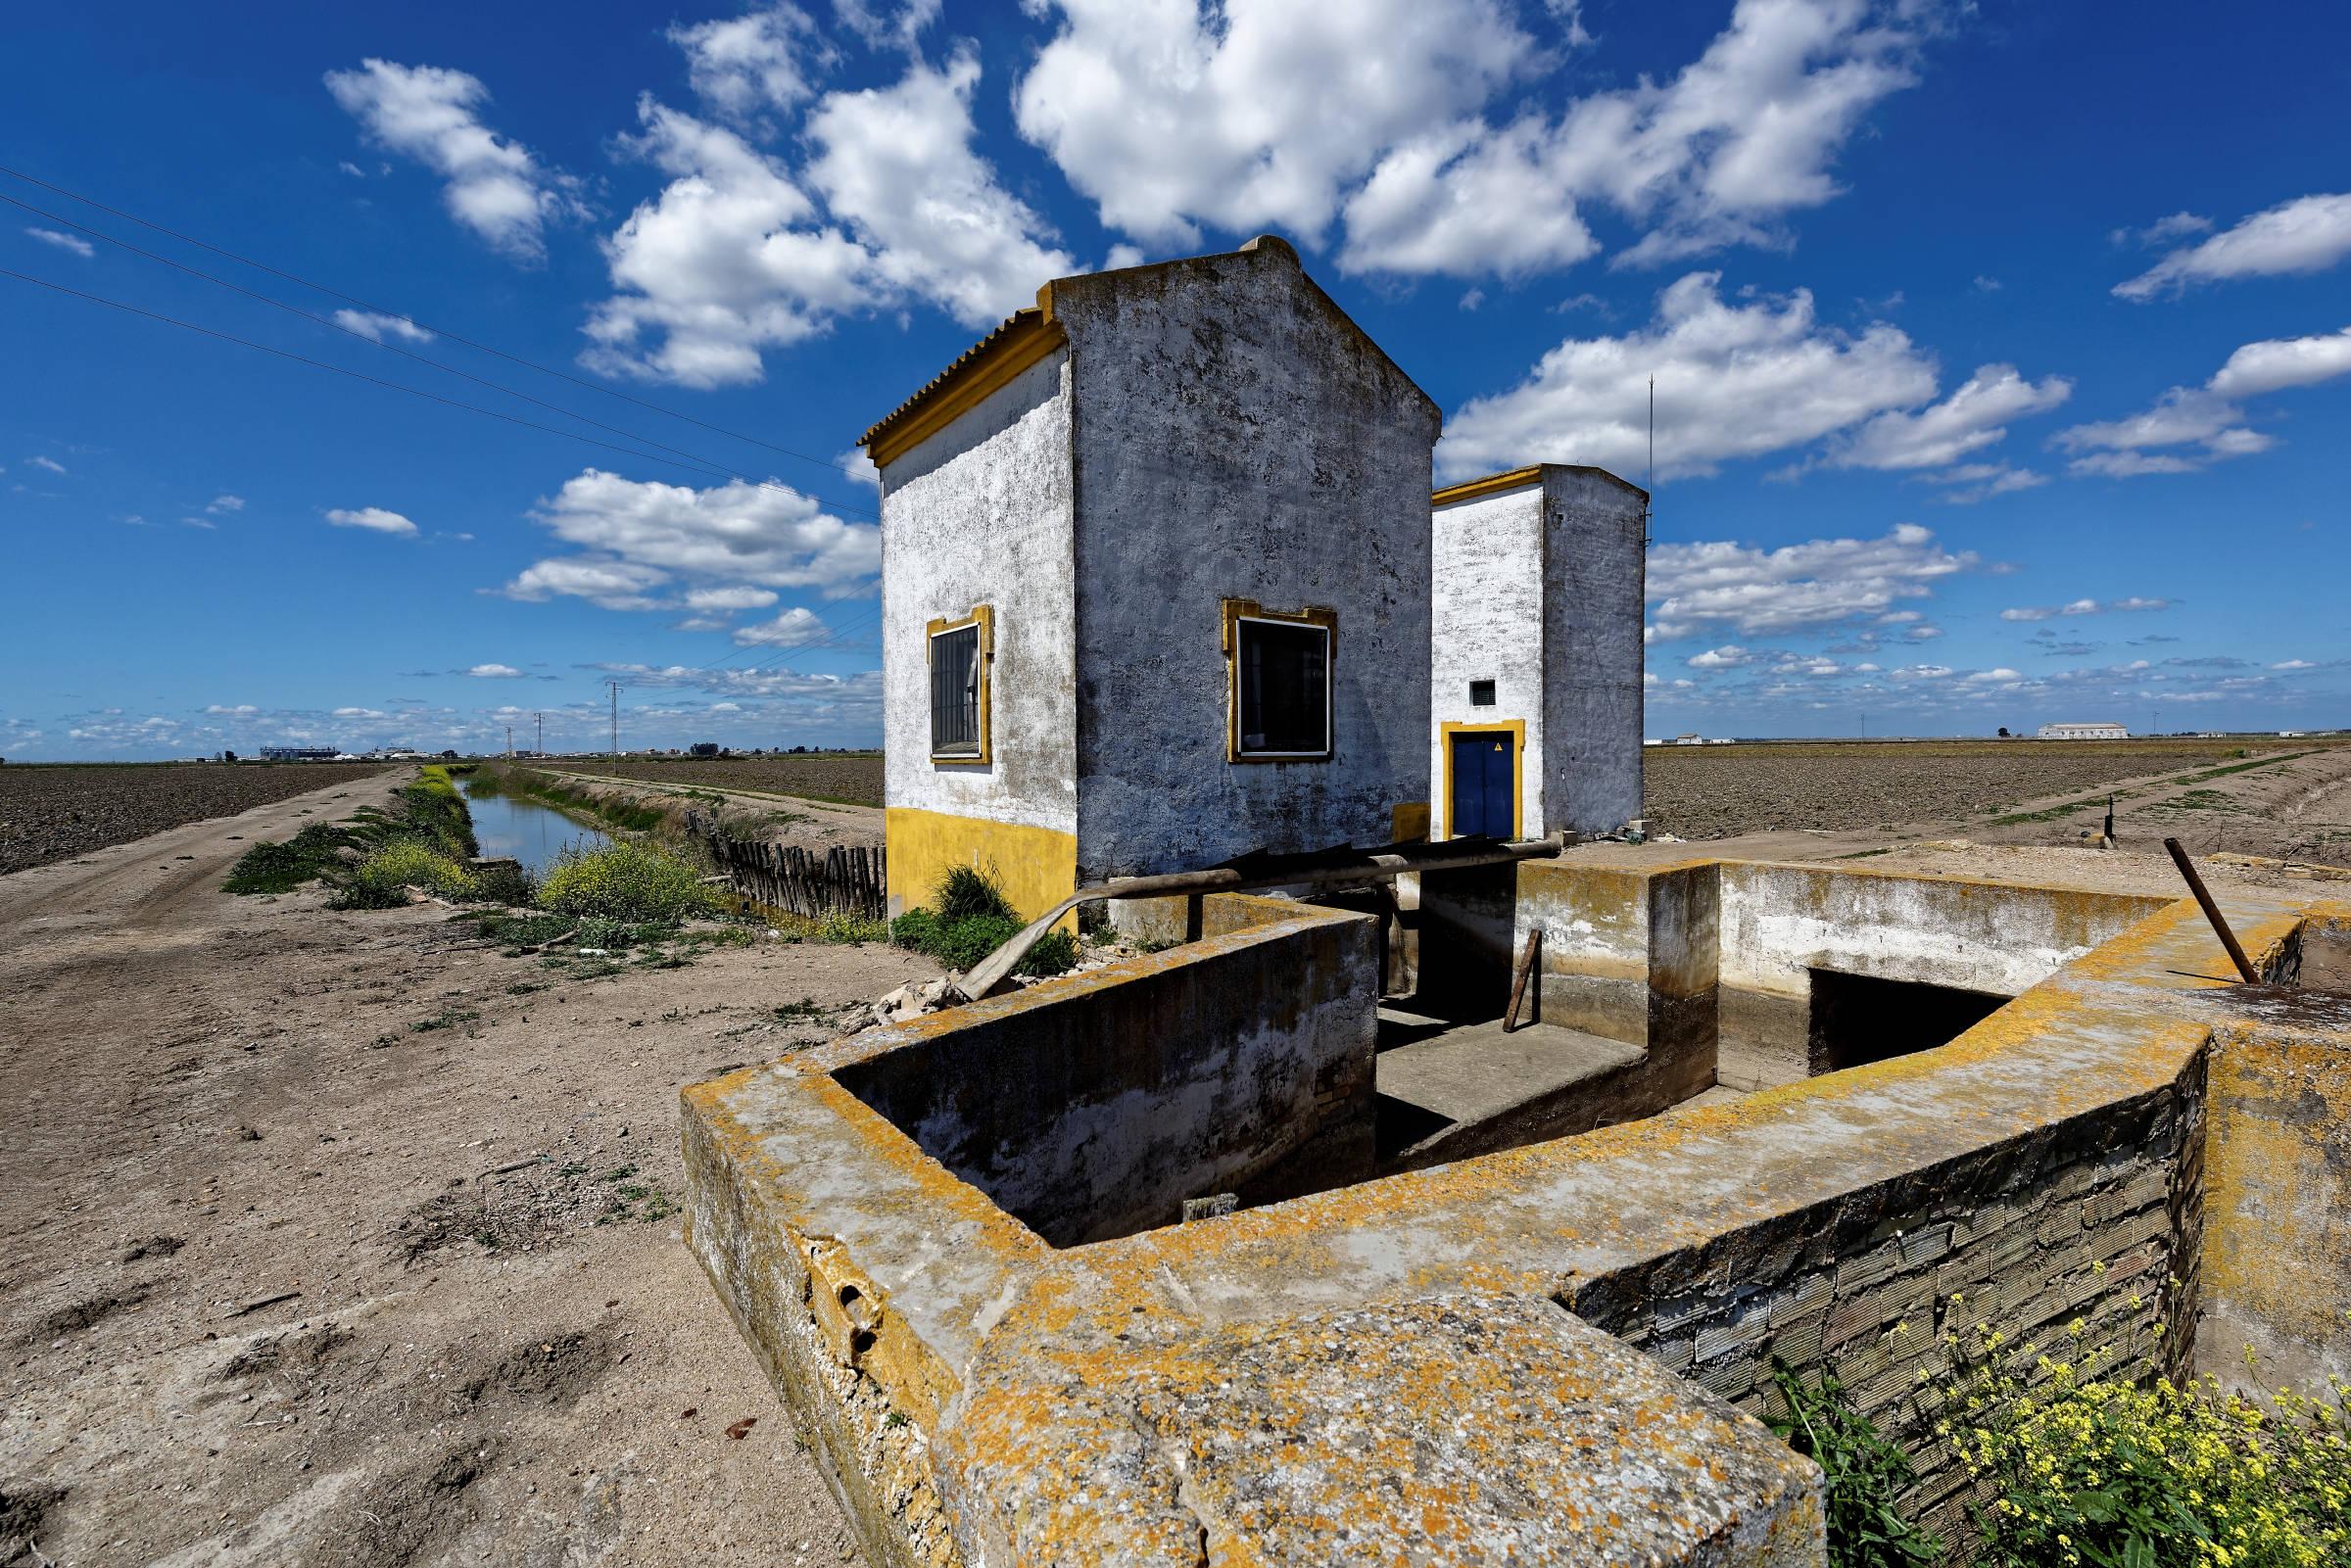 160414-Isla minima - Escobar (Andalousie) (55)